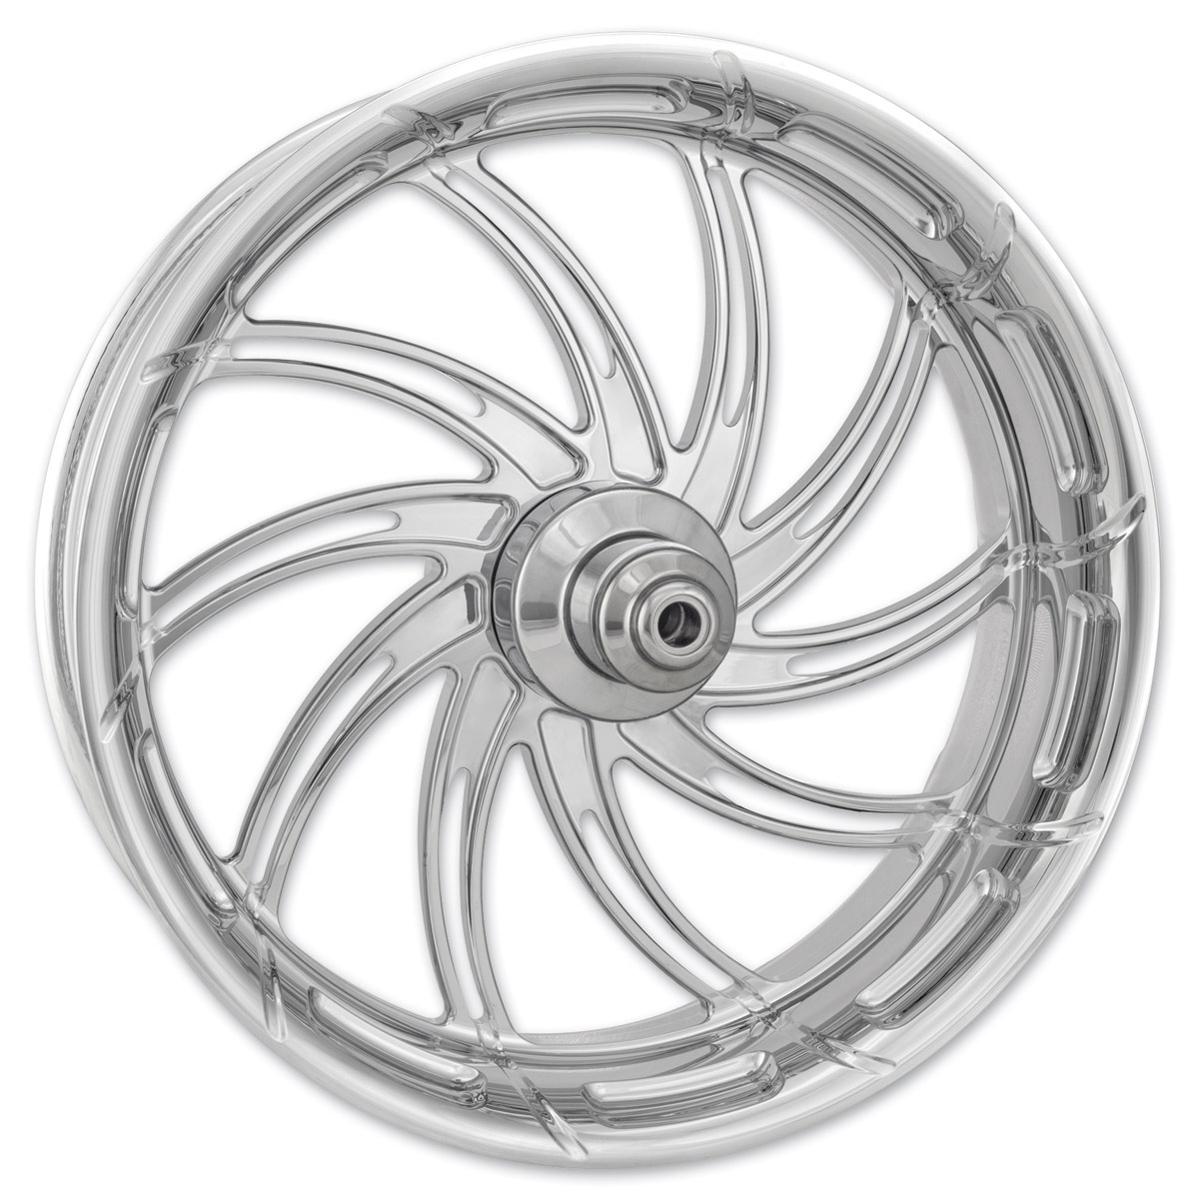 Performance Machine Supra Chrome Front Wheel 21x2.15 Non-ABS